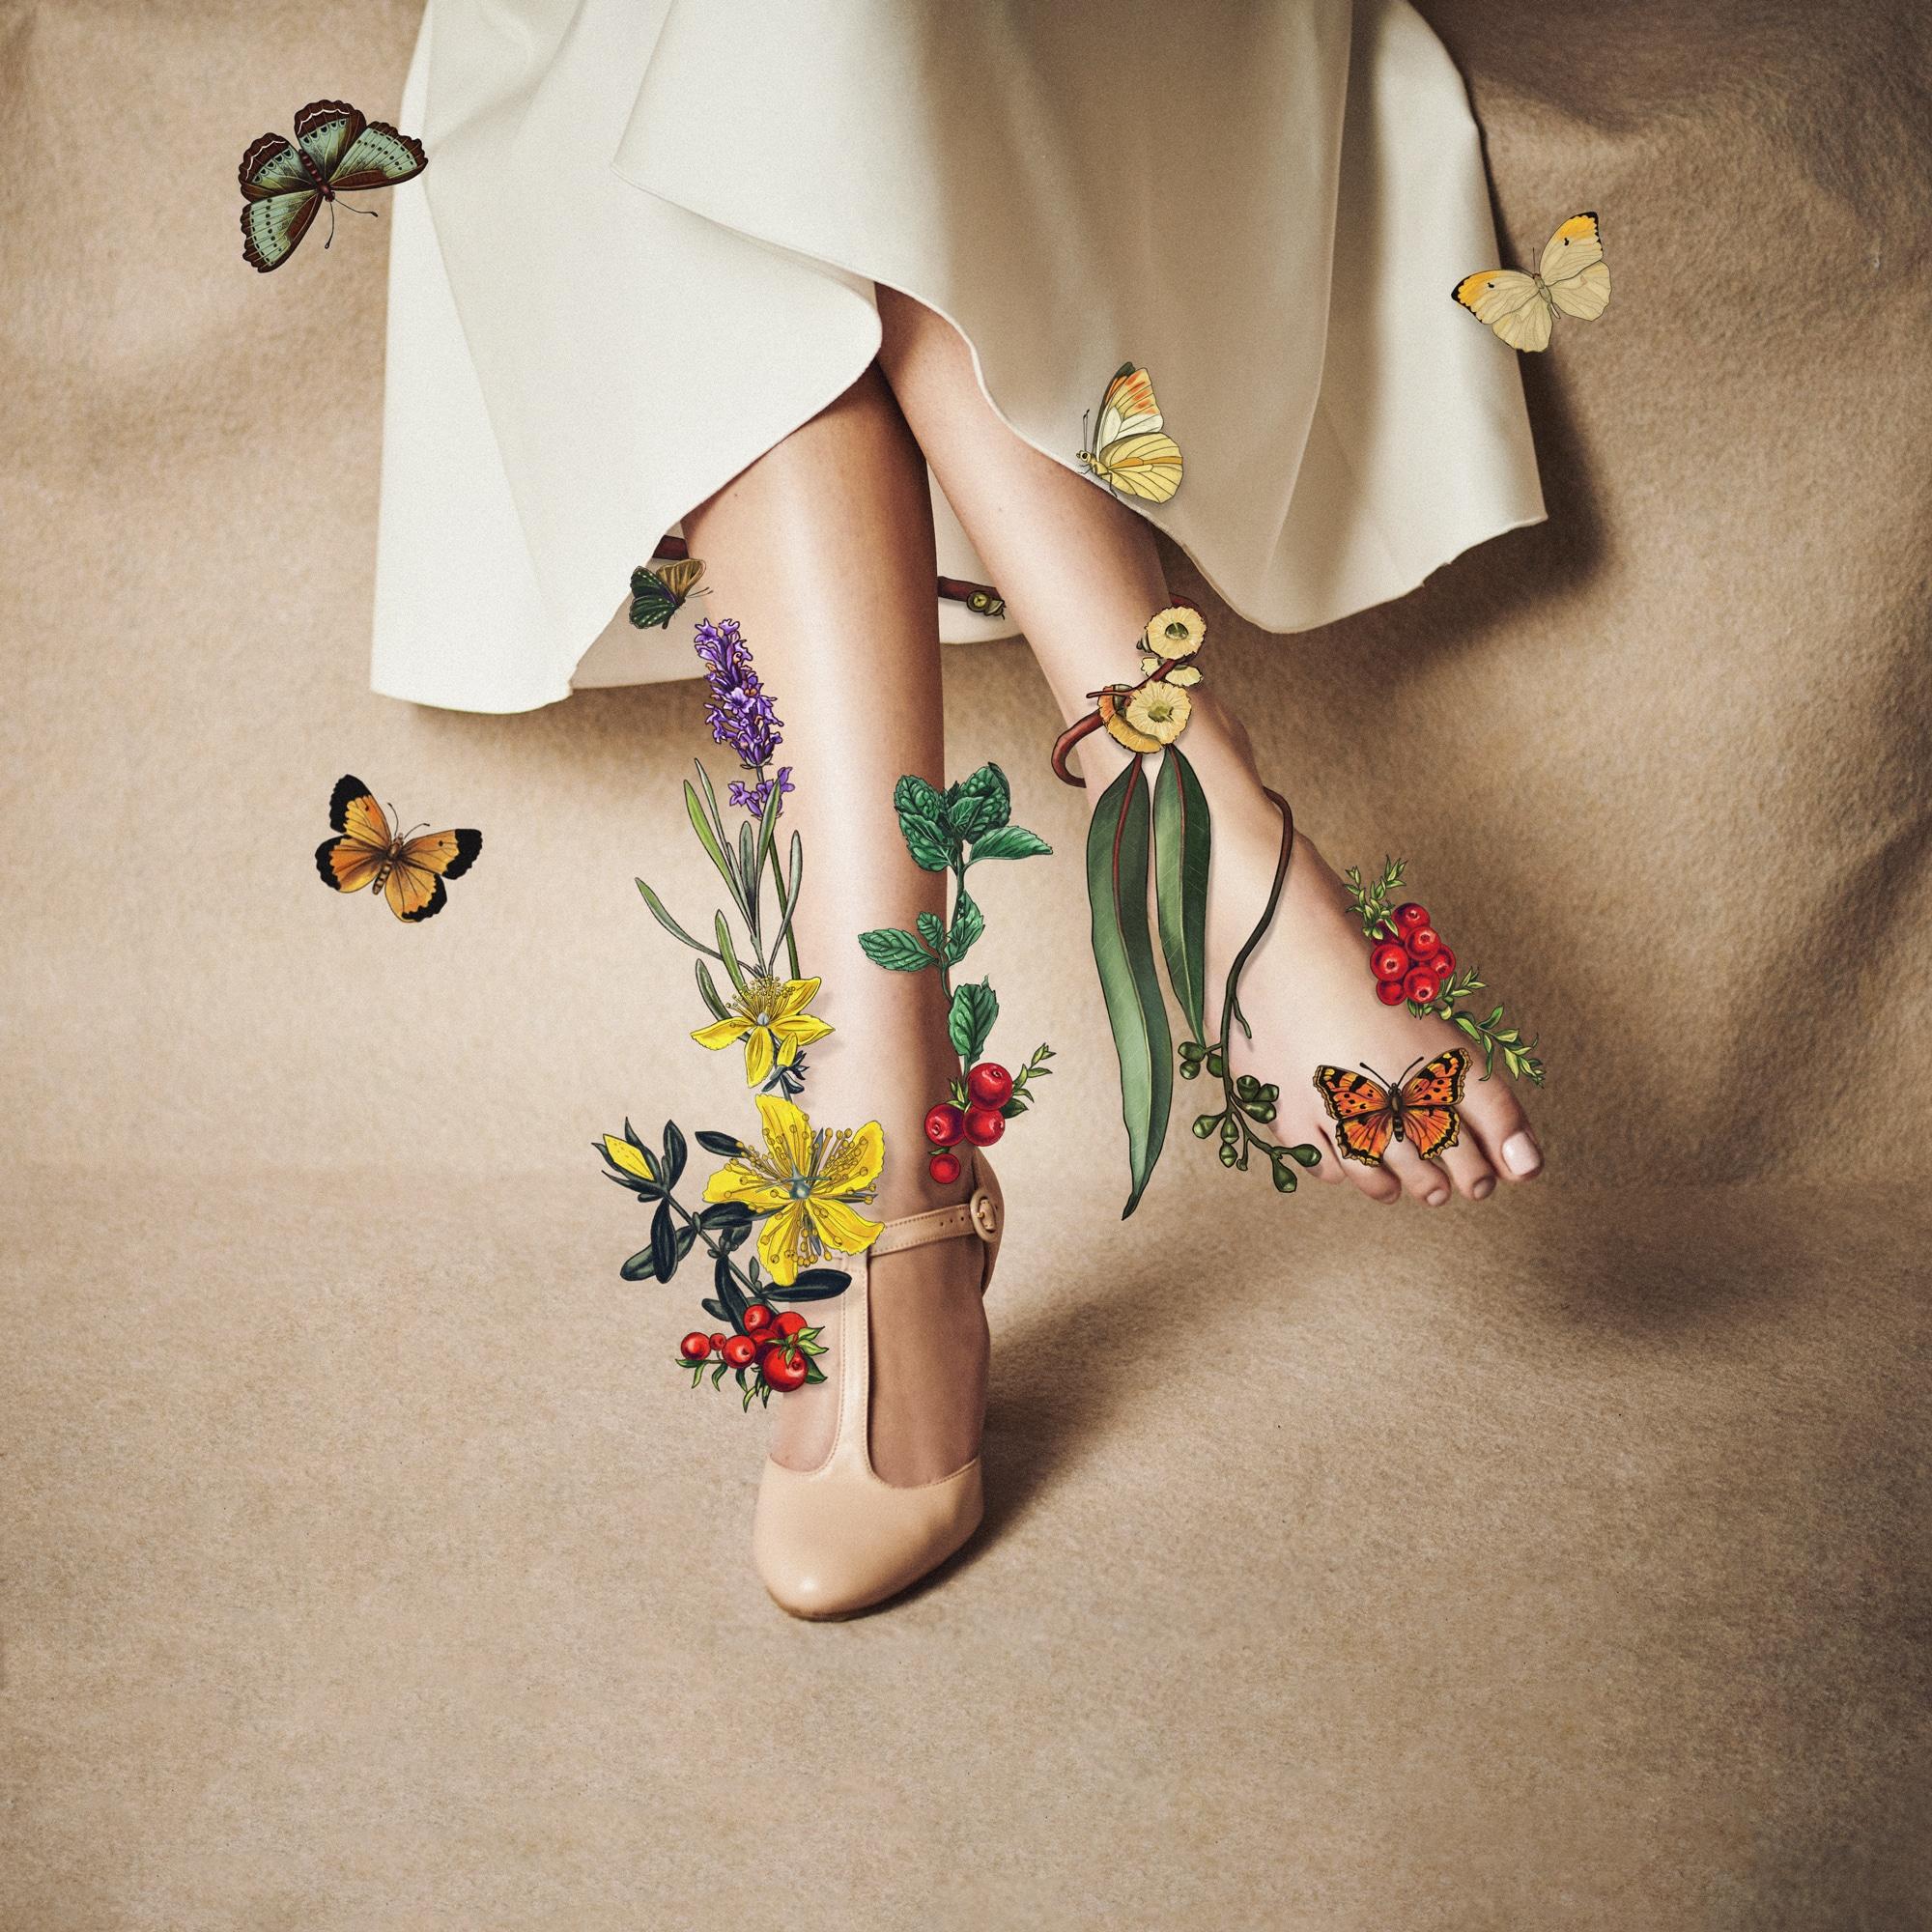 blossomed feet